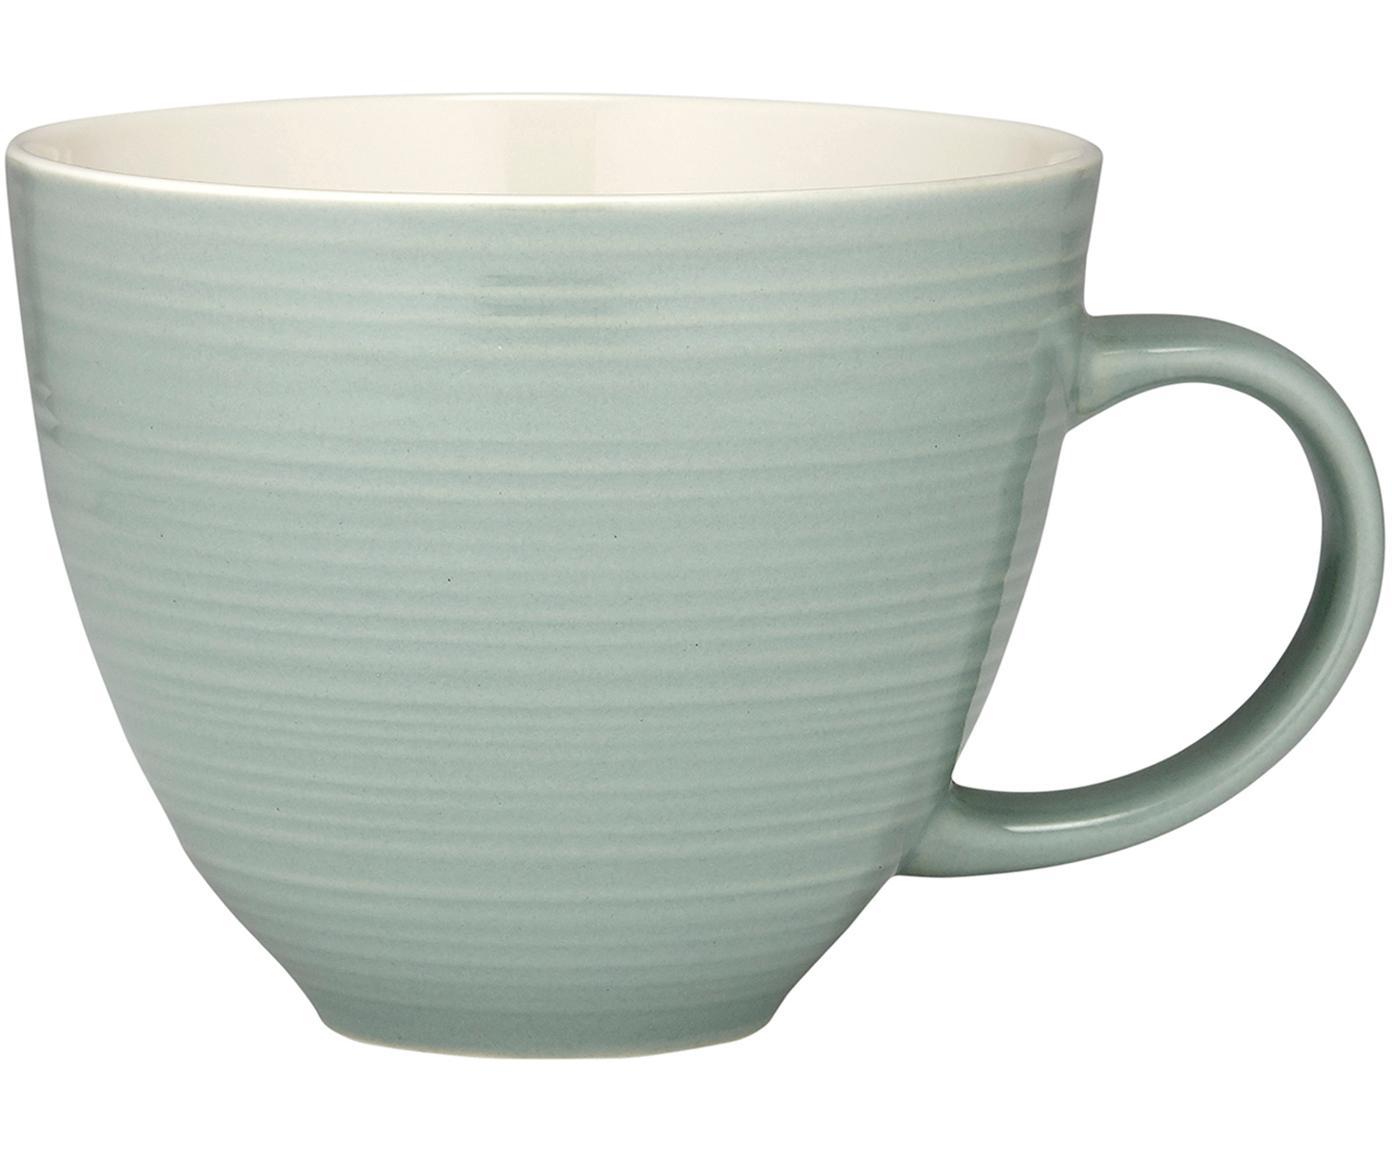 Tazas de café Darby, 4 piezas, Porcelana New Bone, Verde, blanco crudo, Ø 24 x Al 11 cm